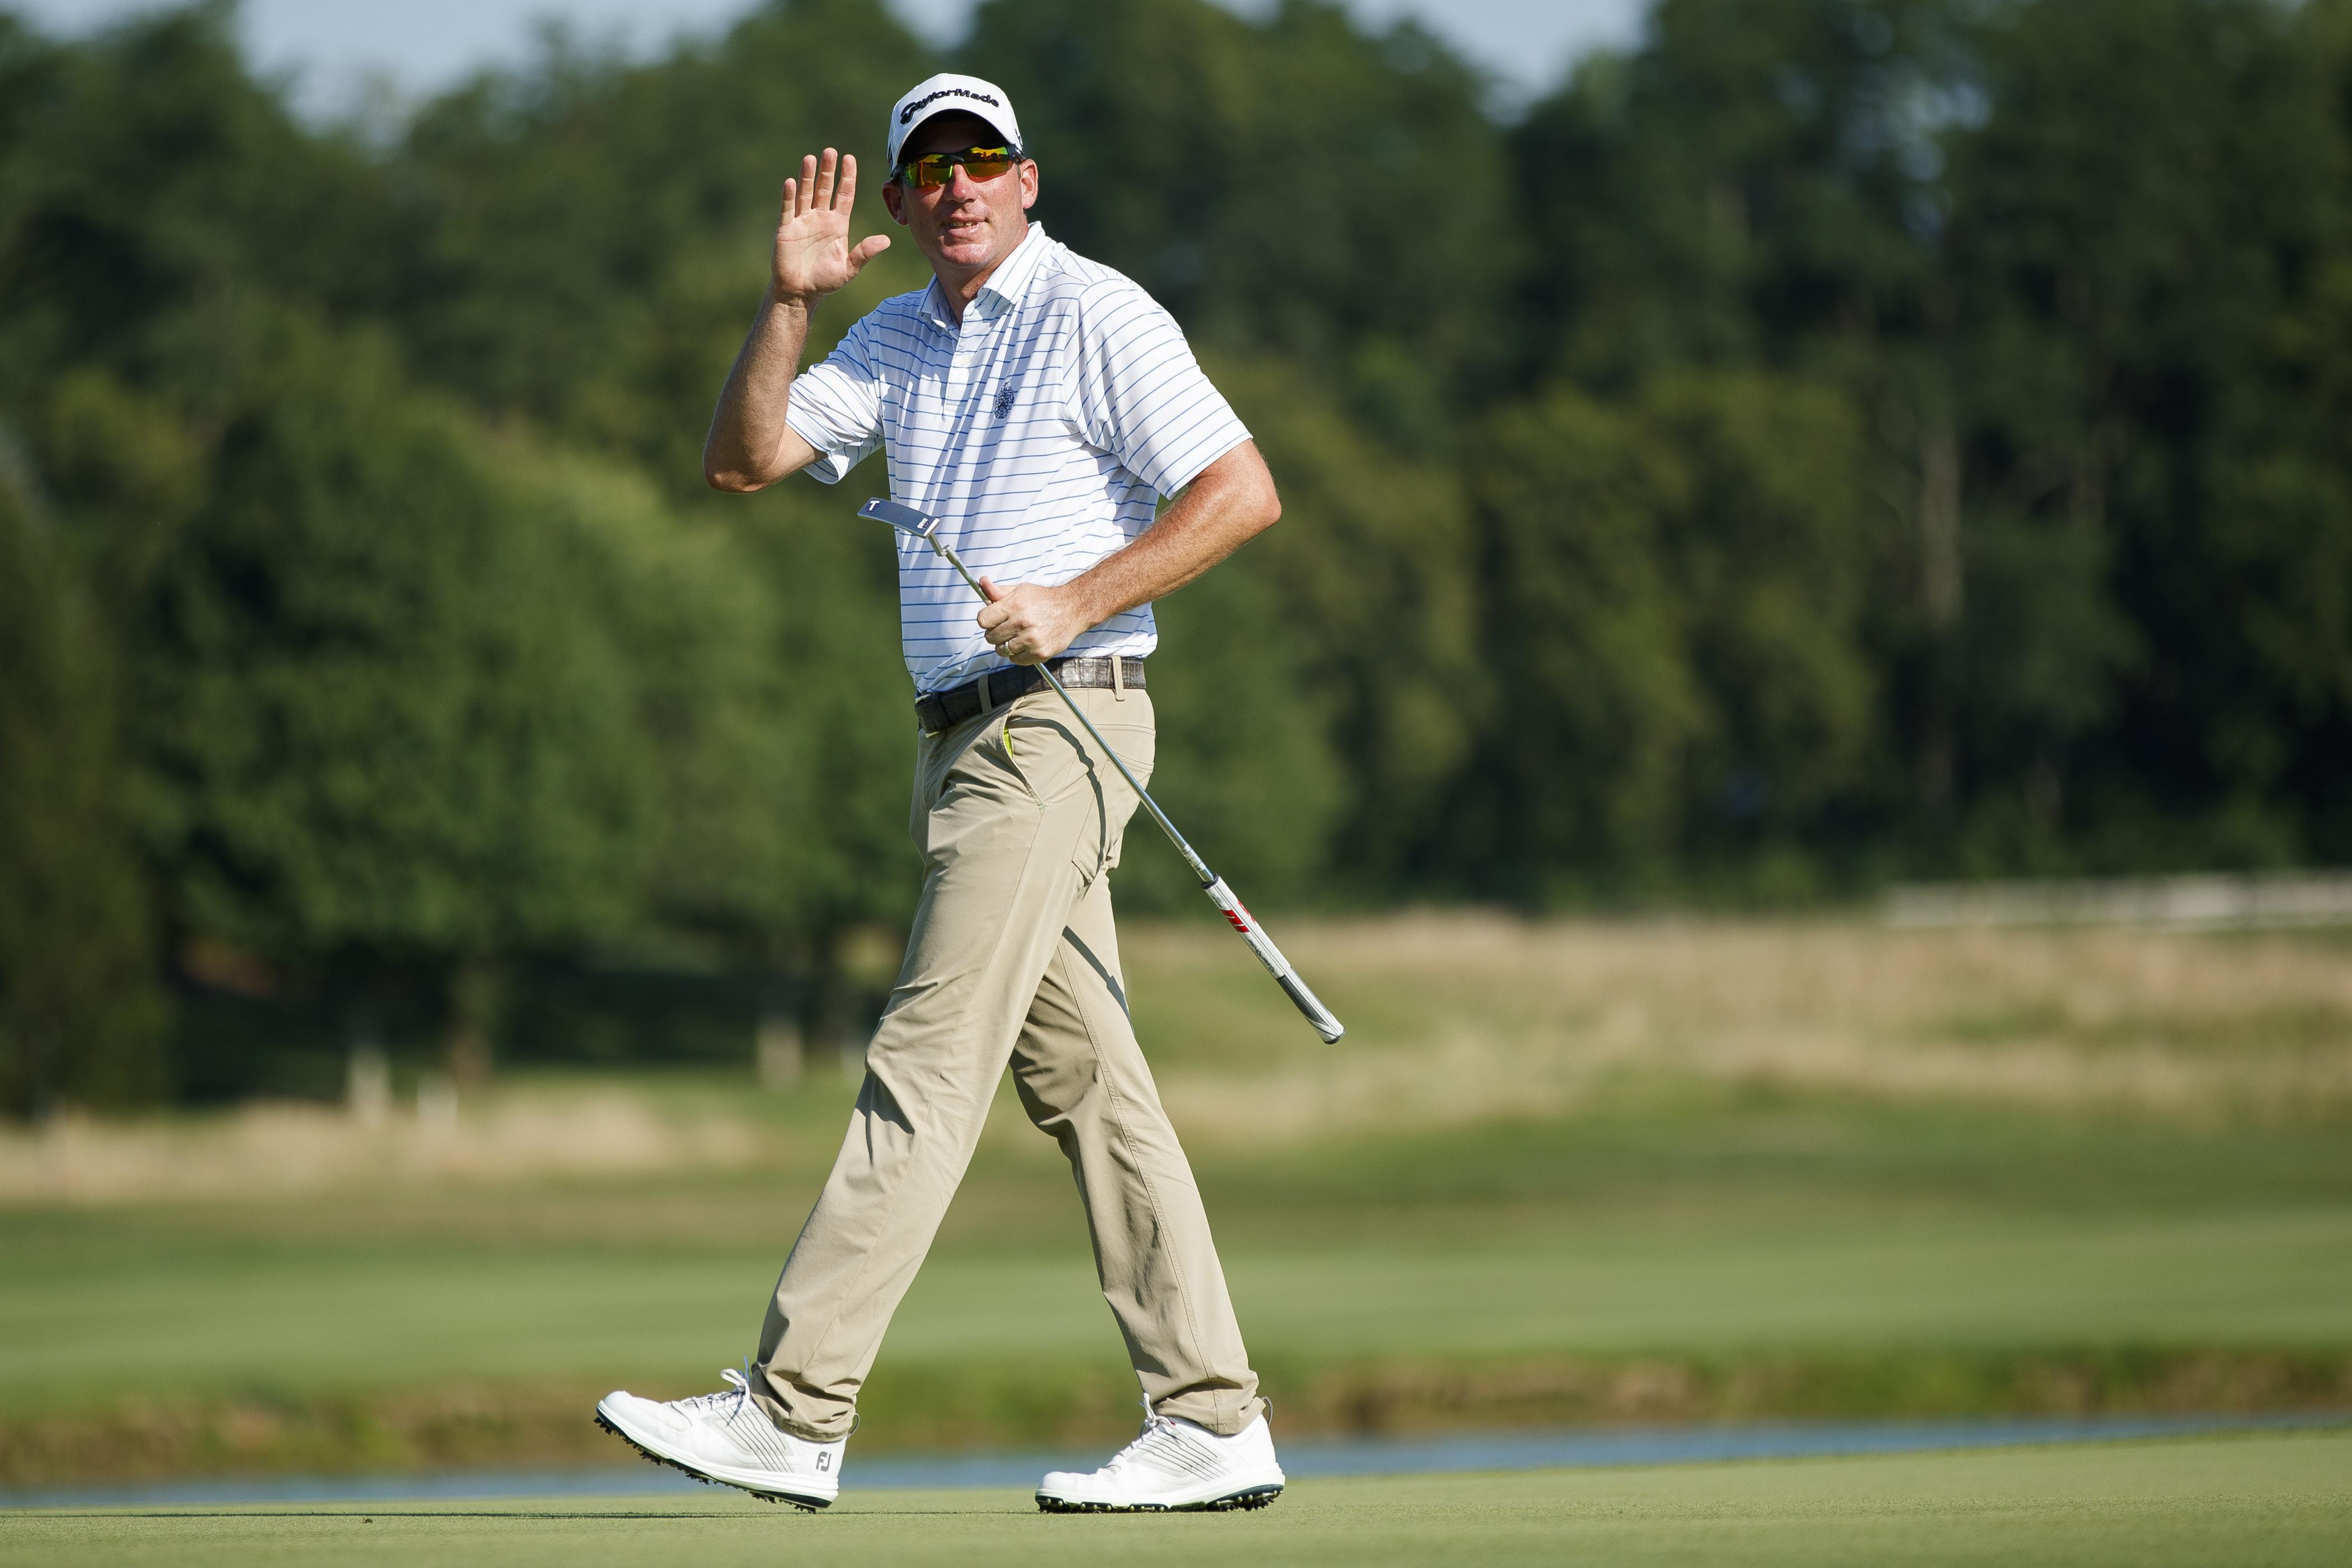 Golfer credits Trump's putting advice amid PGA tournament lead